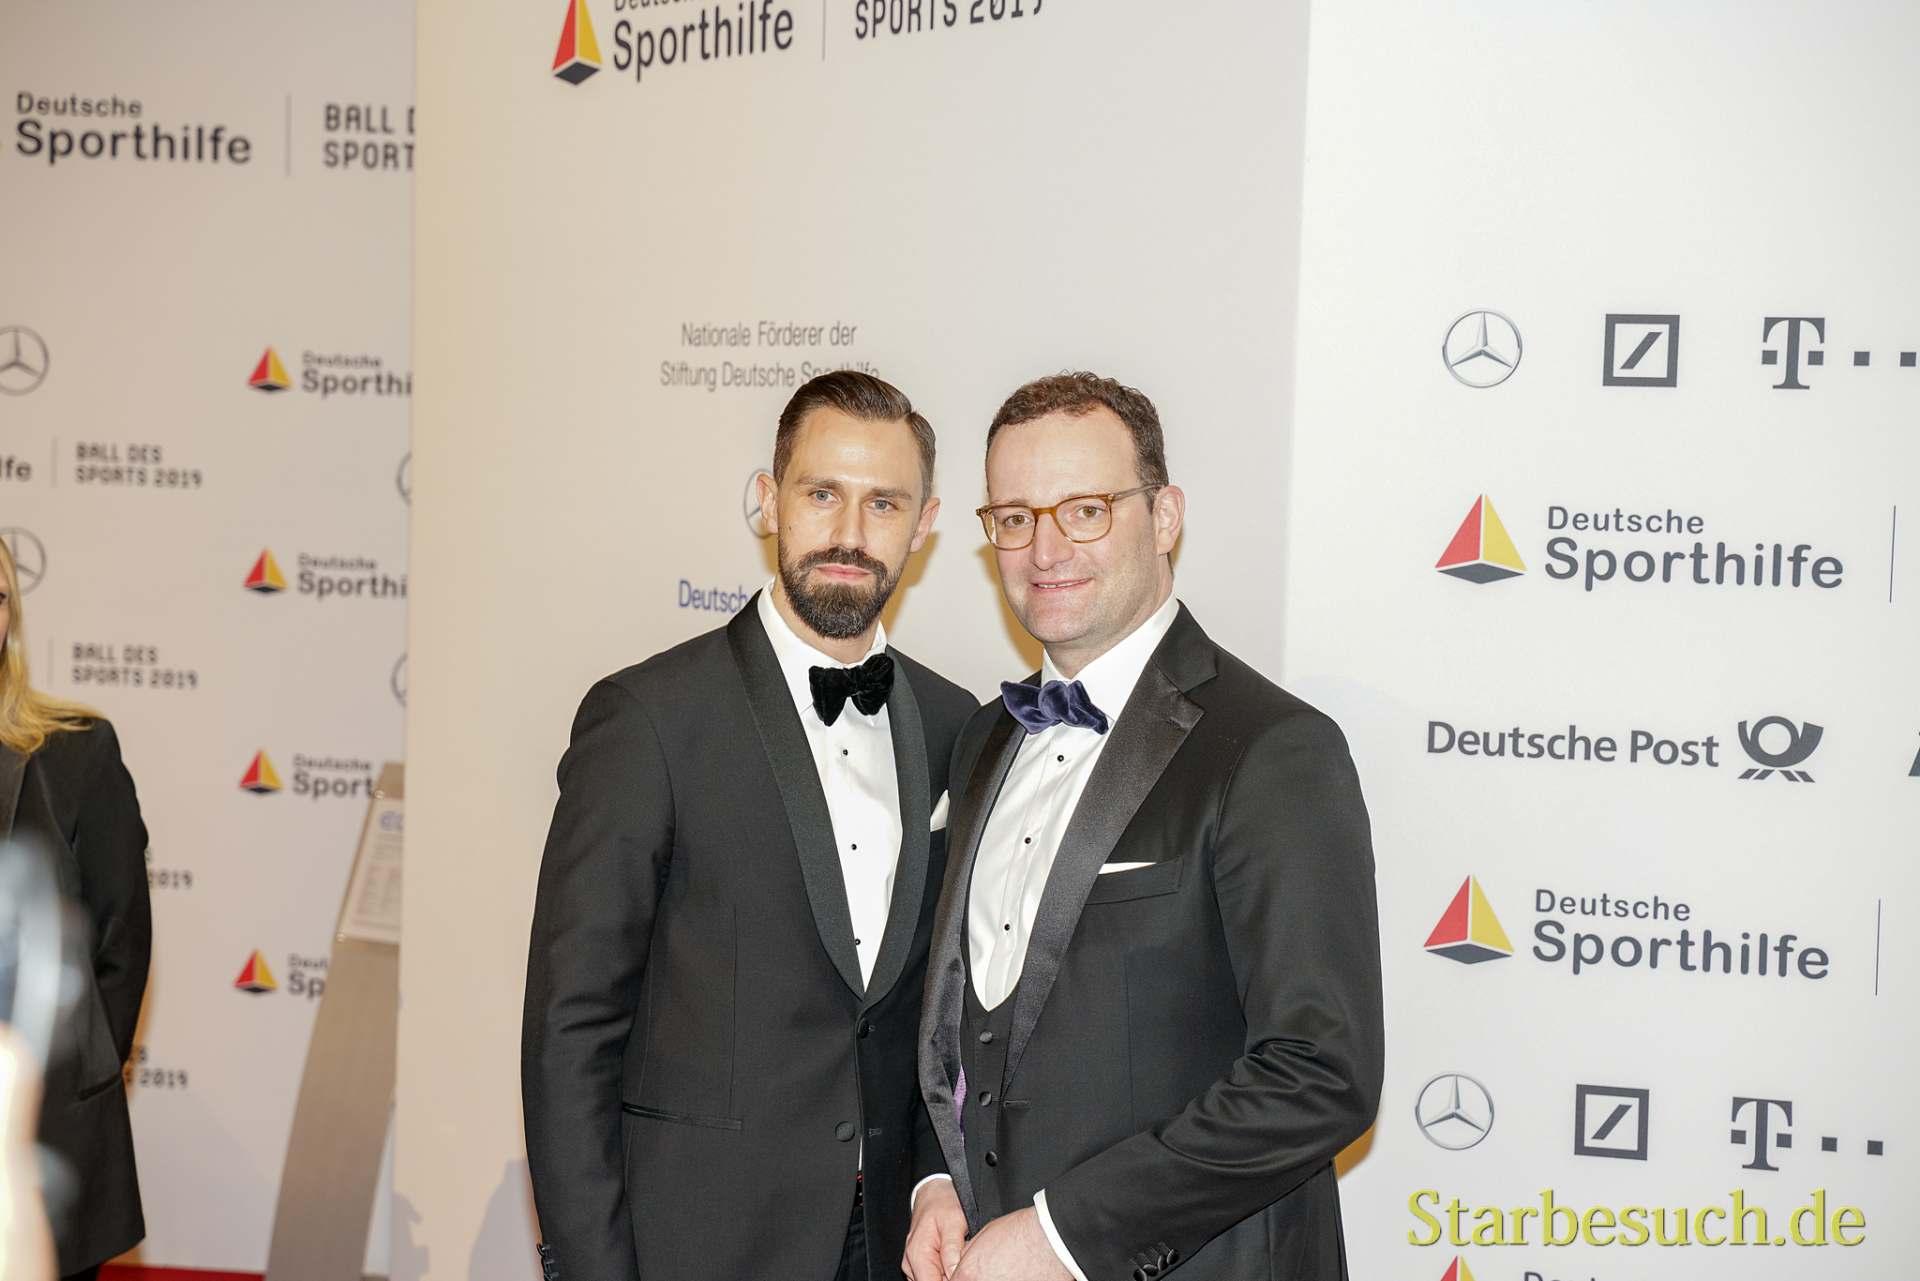 WIESBADEN, Germany - February 2nd, 2019: Daniel Funke and Jens Spahn at Ball des Sports 2019